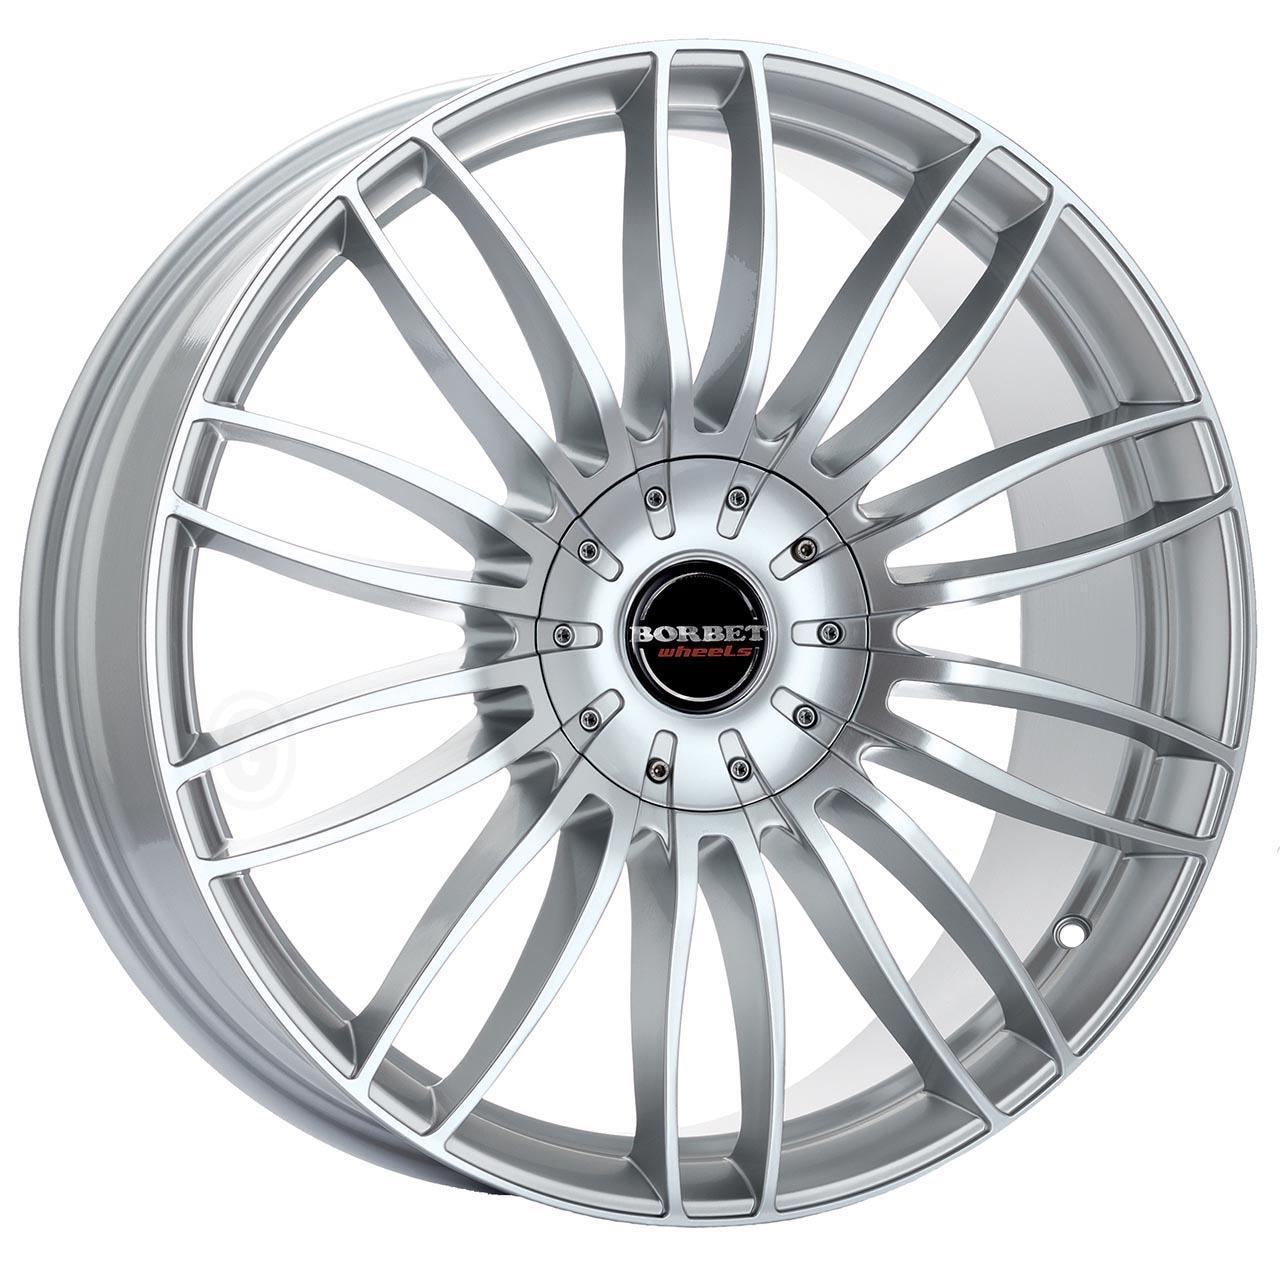 Borbet Cw 3 Sterling silver 10.5x21 5x120 ET35